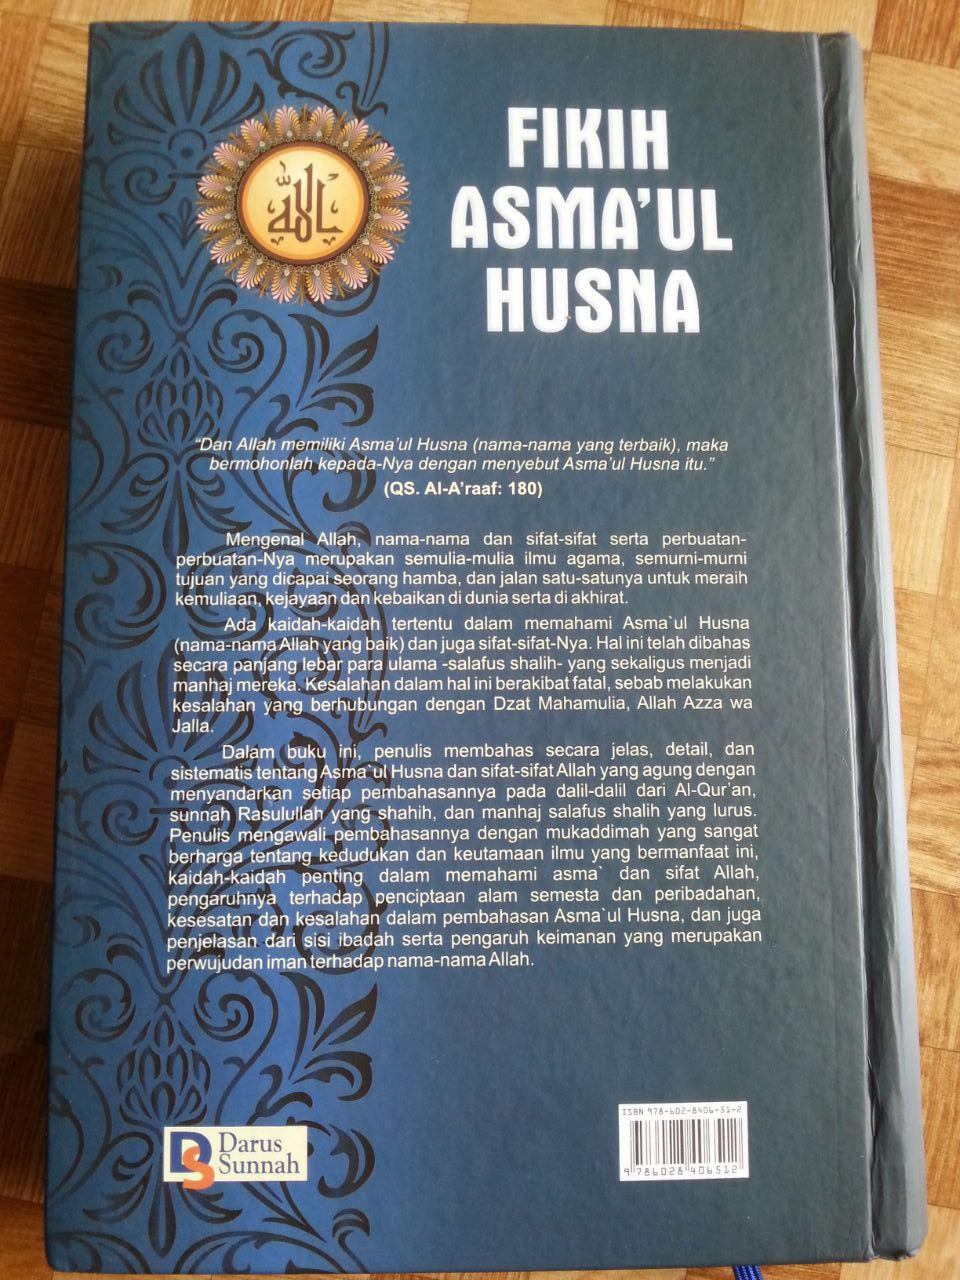 Buku Fikih Asma'ul Husna cover